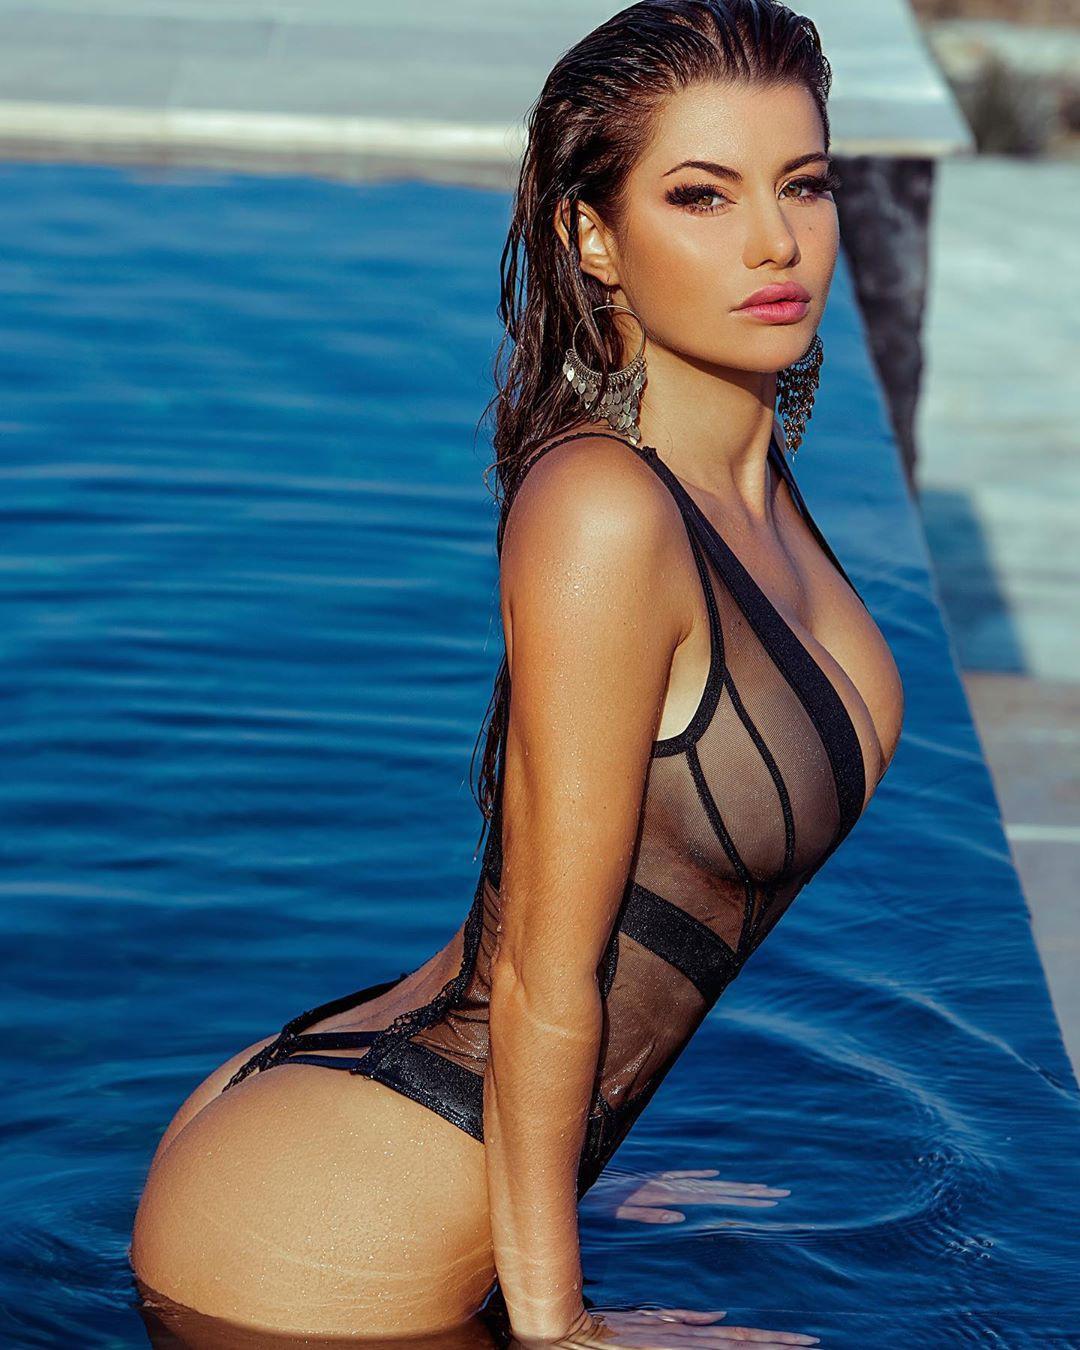 Bianca Richards bikini swimwear outfit style, best photoshoot ideas